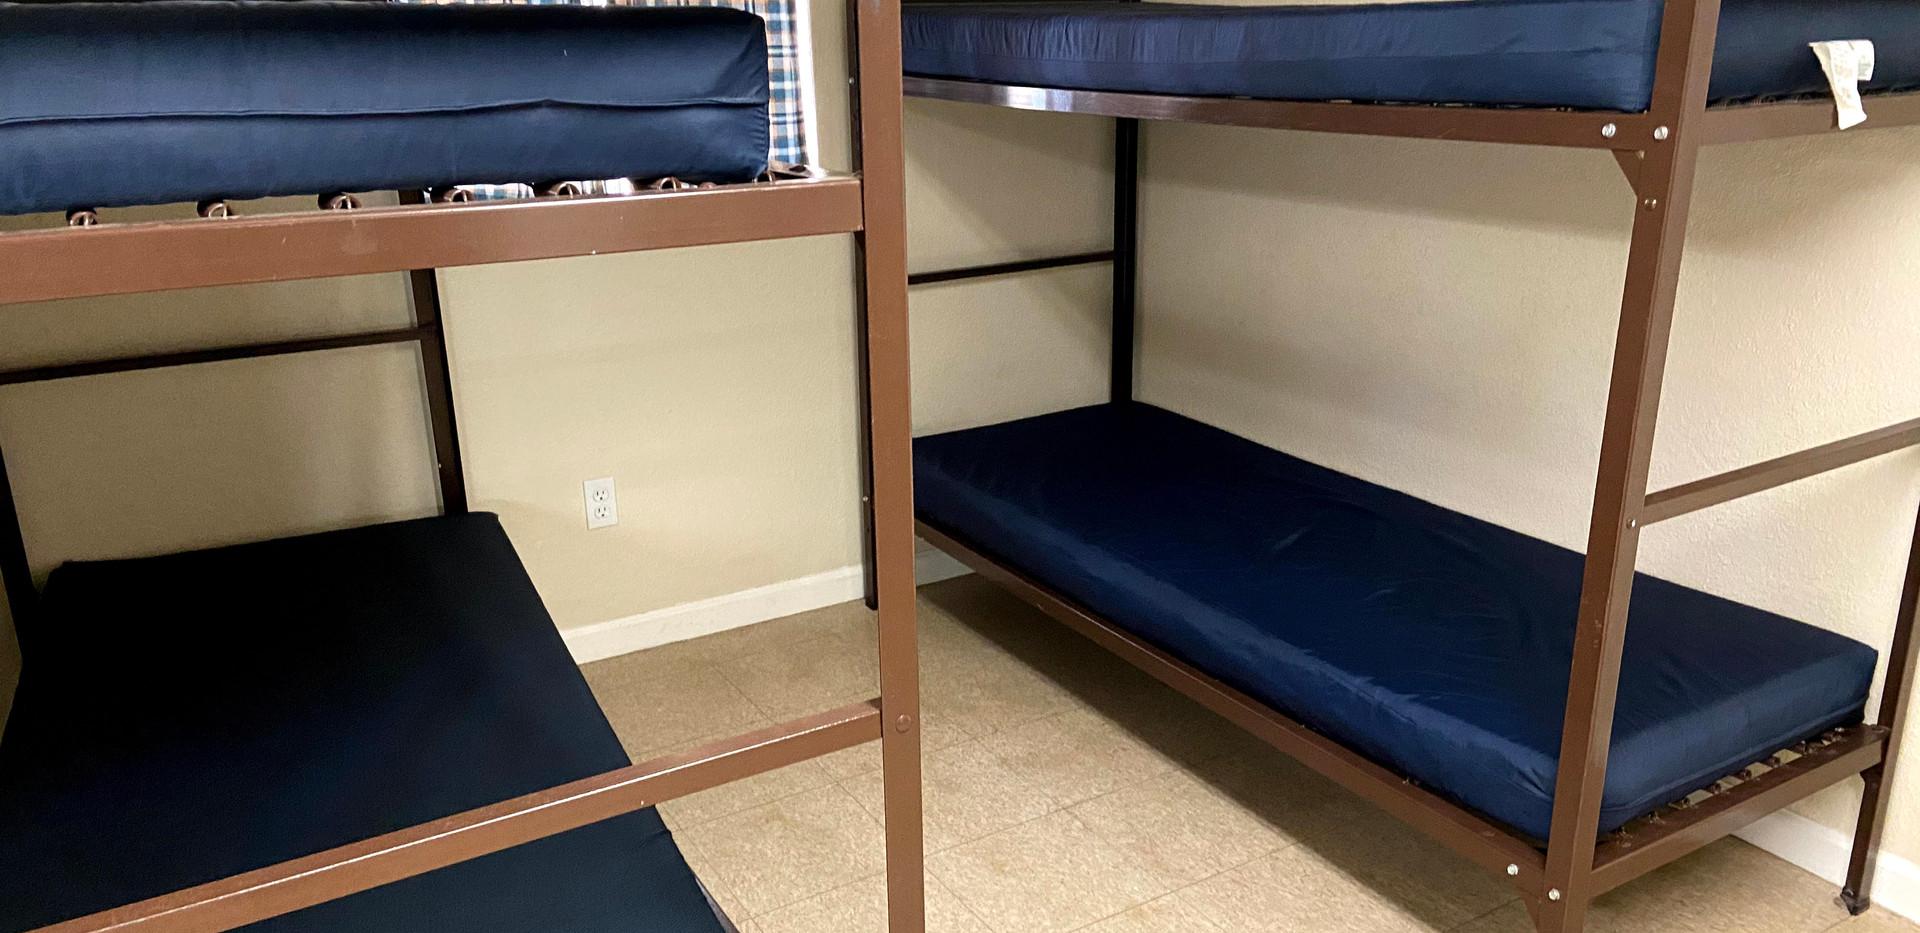 Chalet Beds